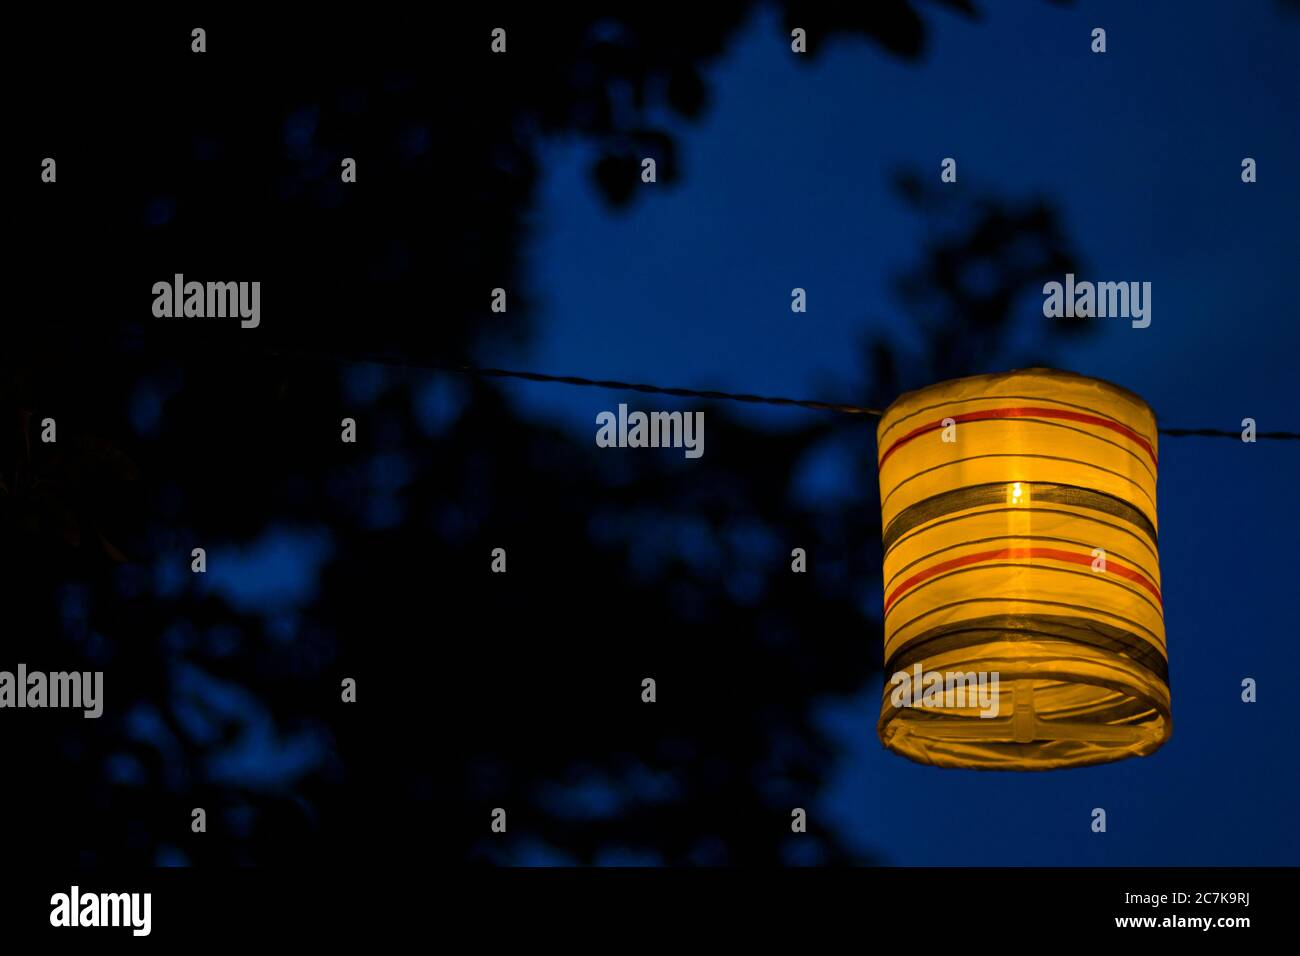 Lantern in the yard, night and warm light, hanging lanterns, natural light, evening time. Stock Photo